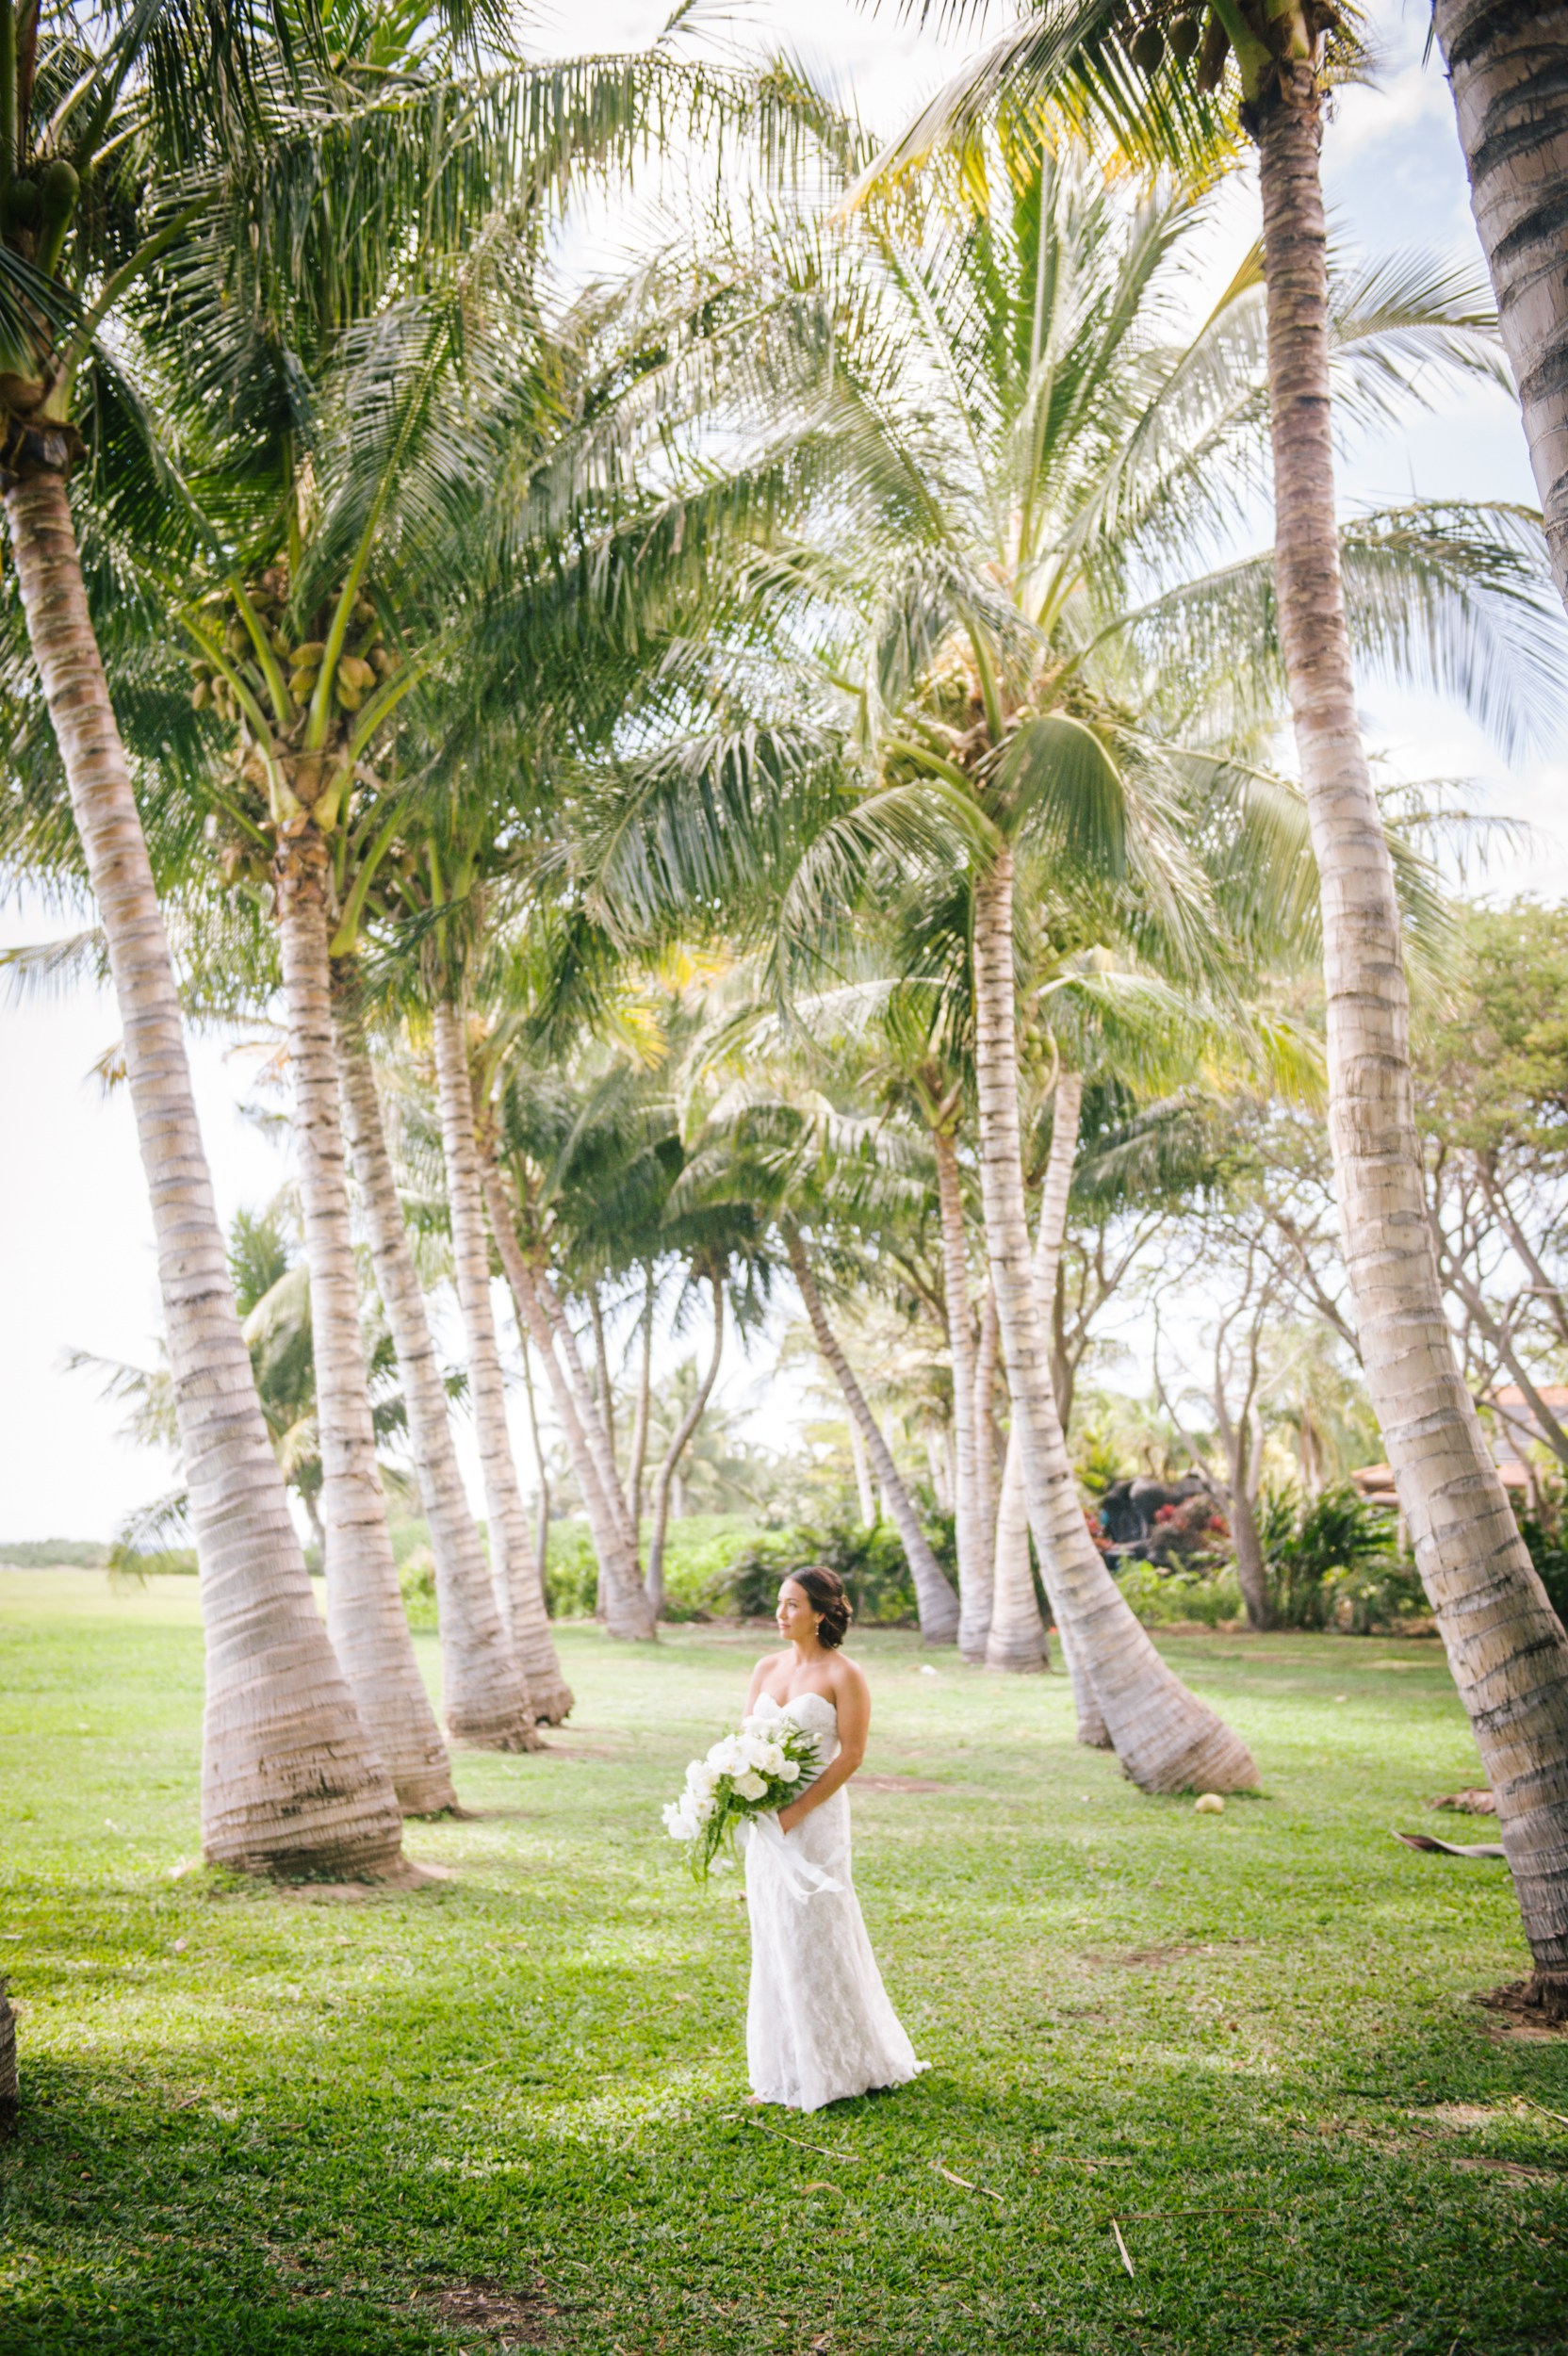 JKP-Destination-Weddings-0041.JPG